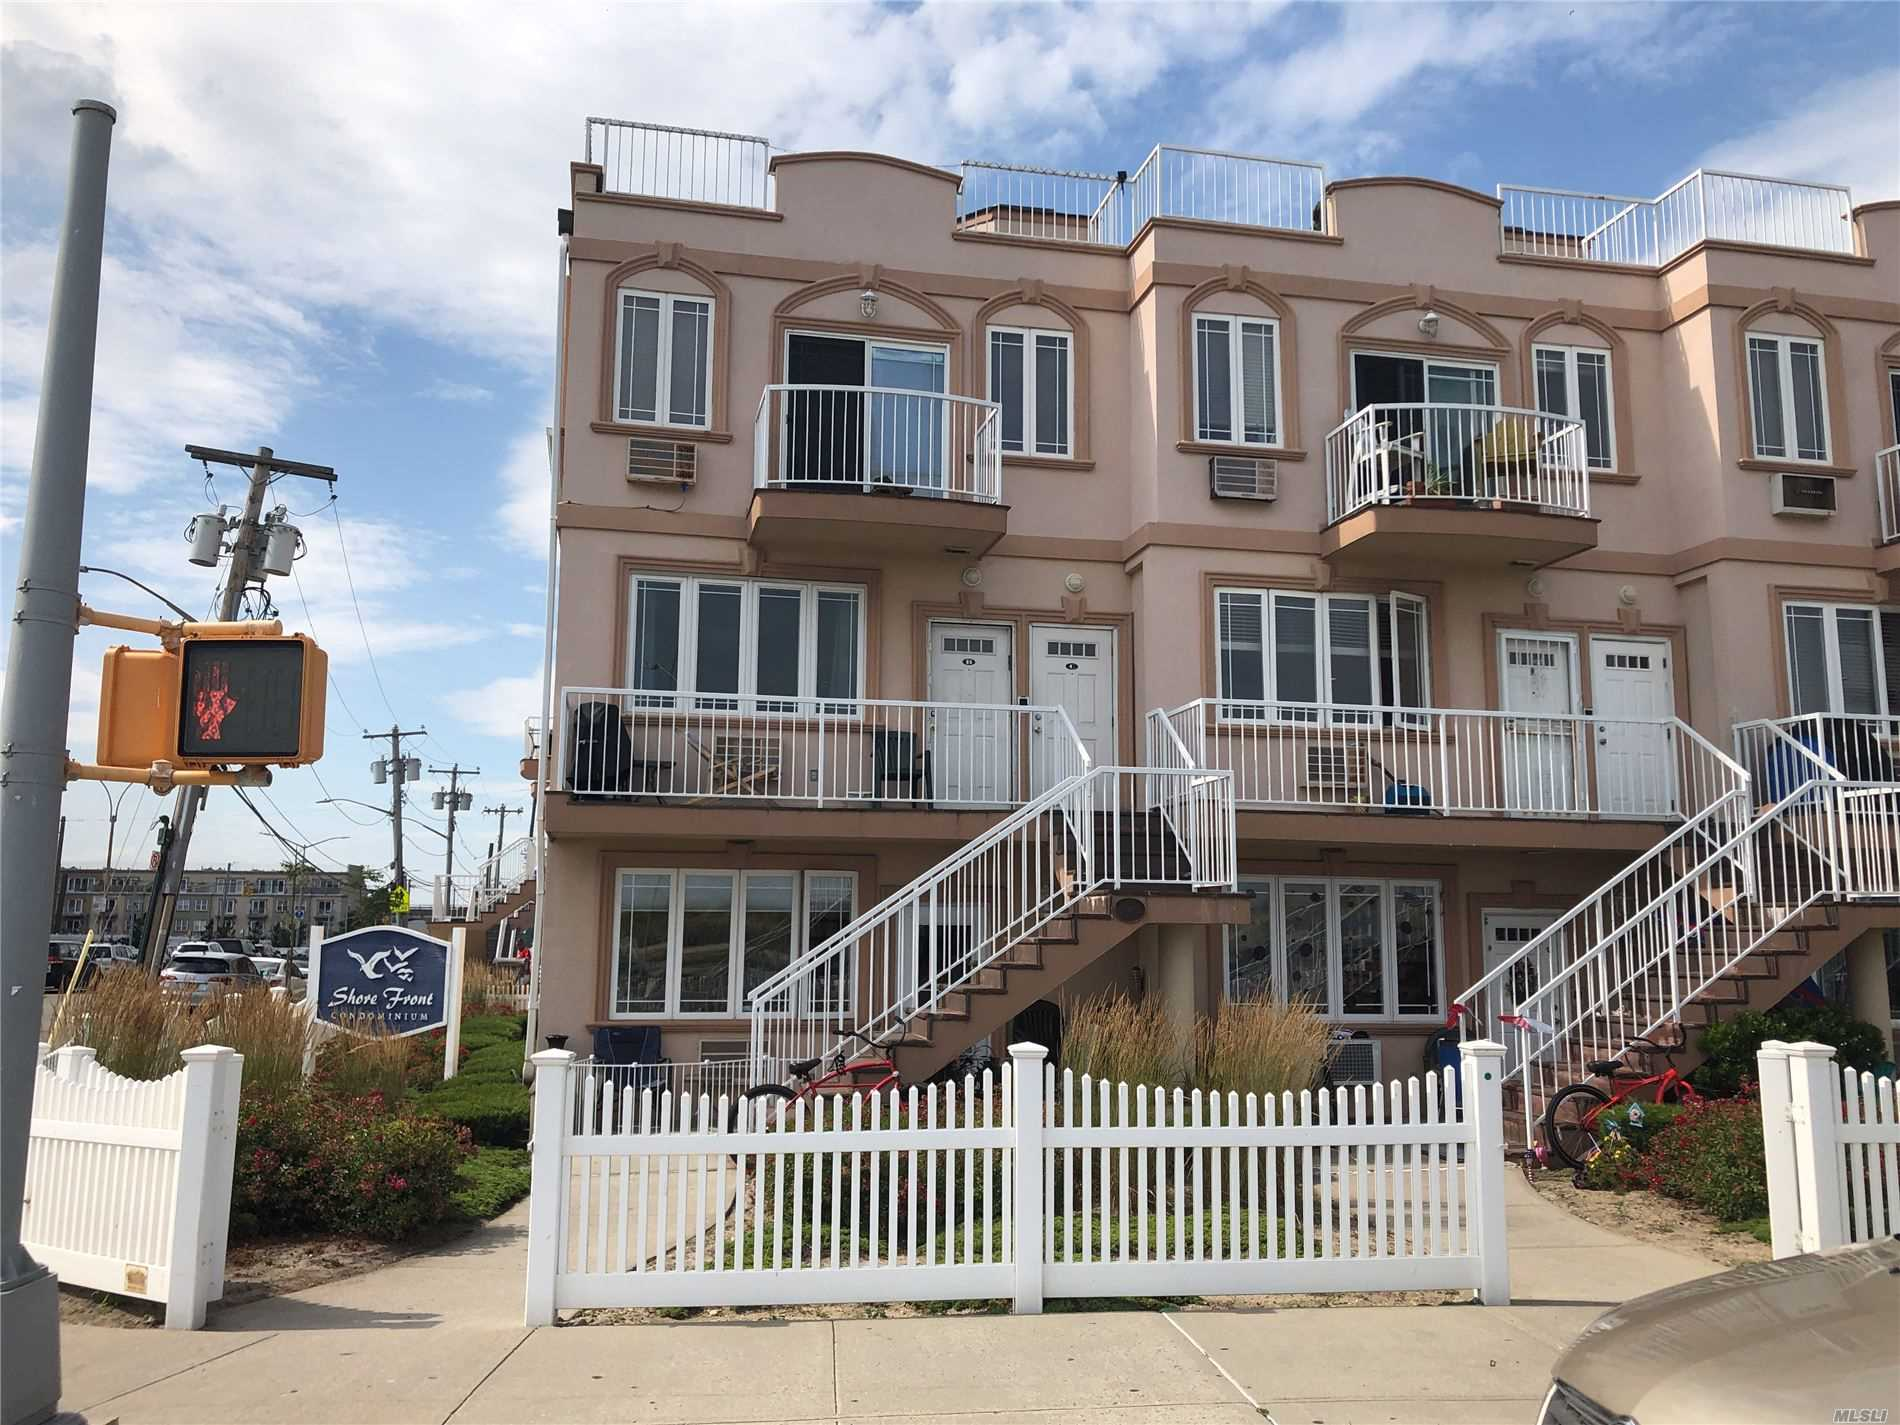 Property for sale at 101-20 Shore Front Parkway # C, Rockaway Park NY 11694, Rockaway Park,  New York 11694